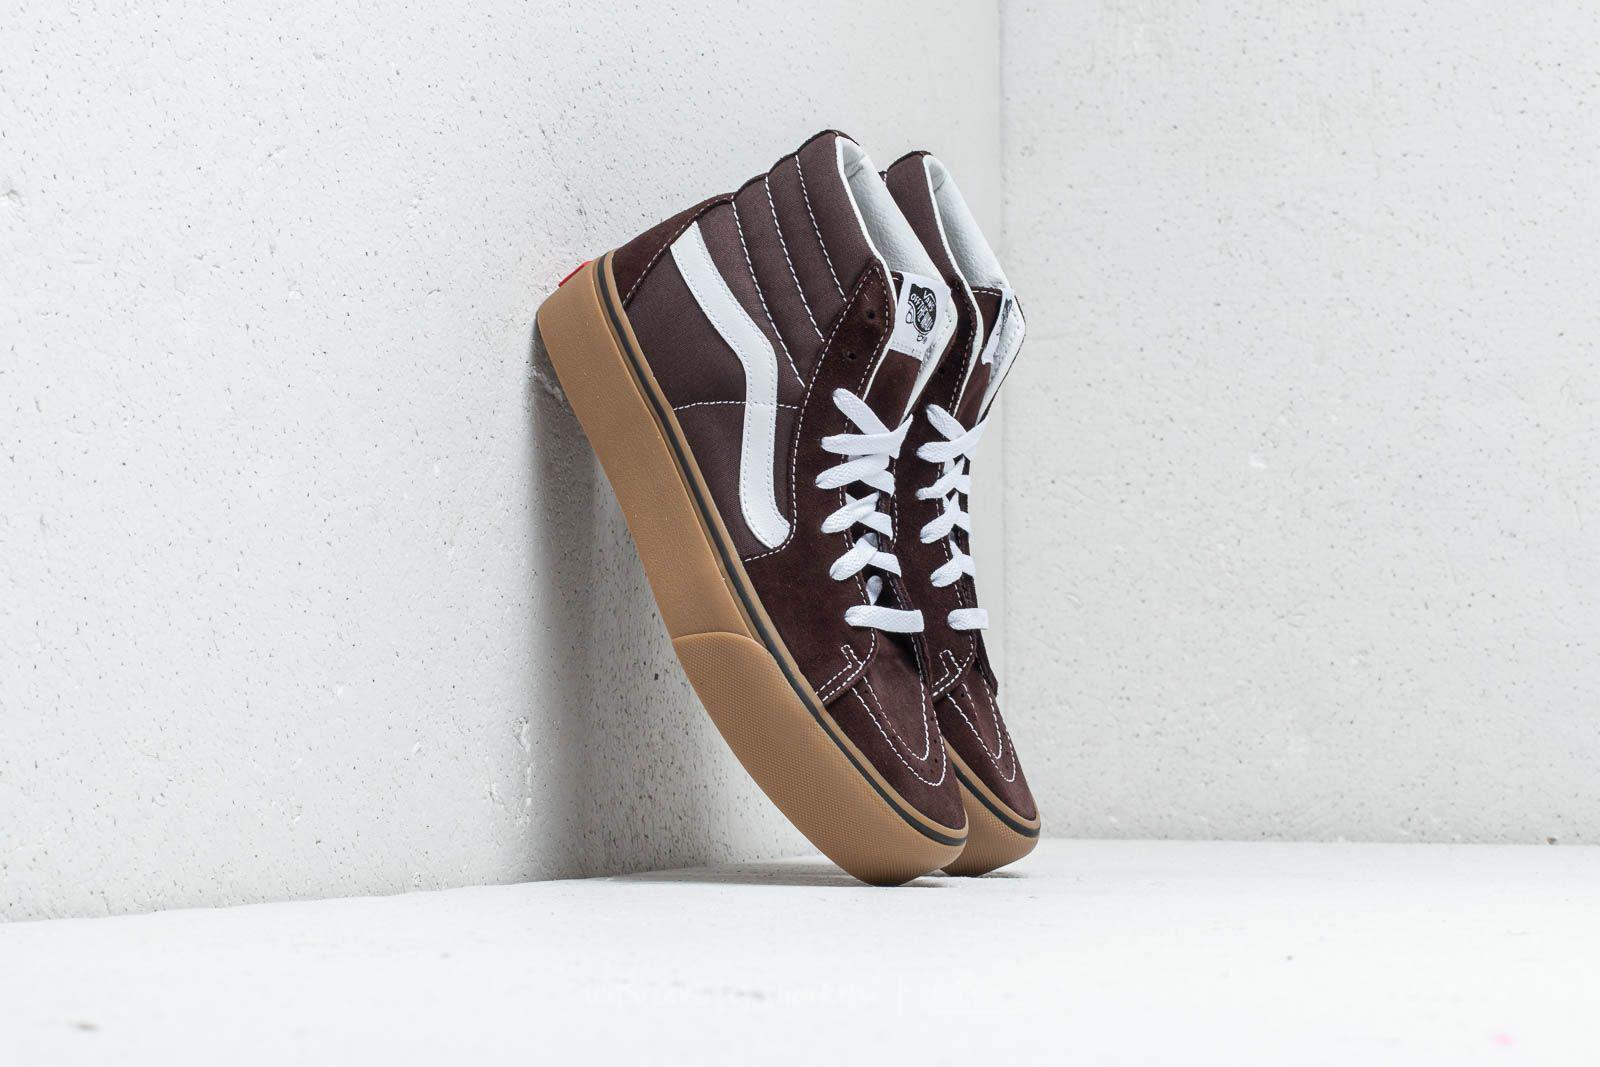 e9975a84dd6 Lyst - Vans Sk8-hi Platform 2 (gum) Chocolate Torte  Tru in Brown ...